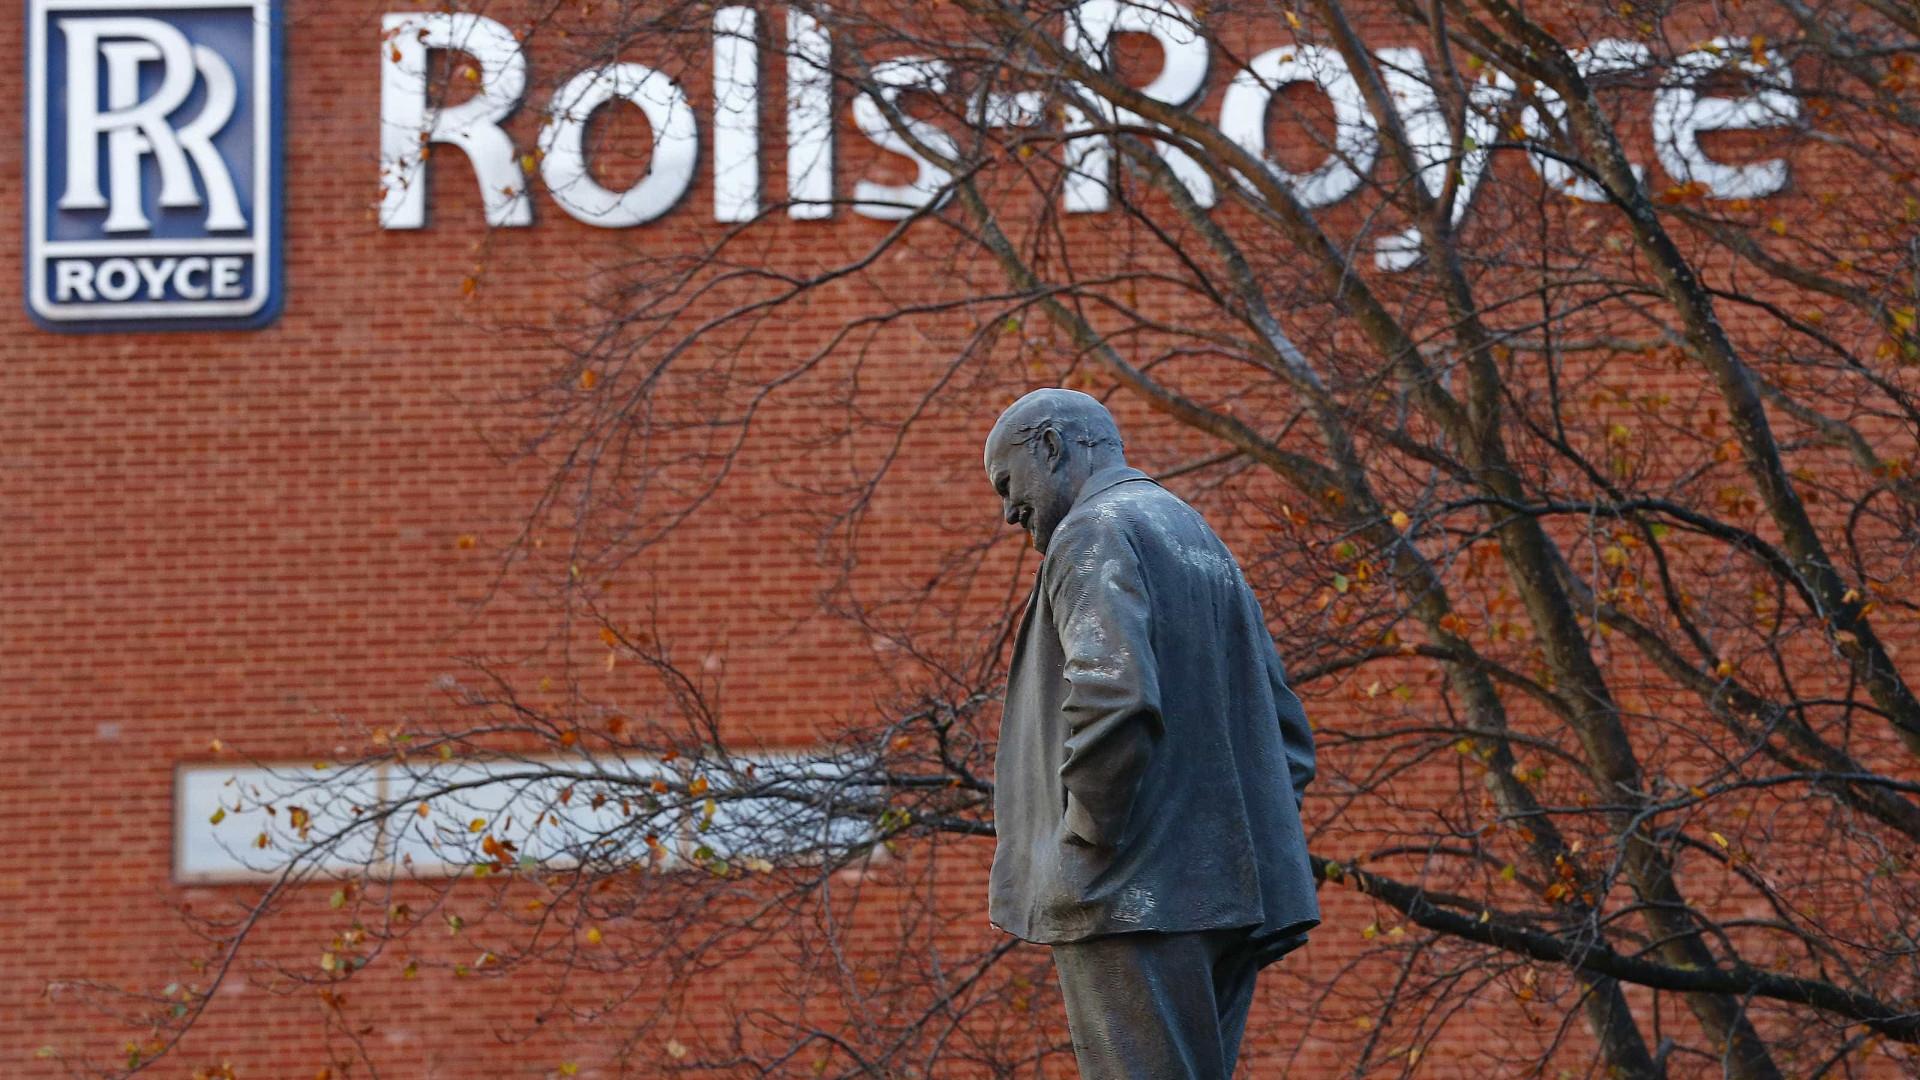 Rolls-Royce vai cortar 800 postos de trabalho no próximo ano